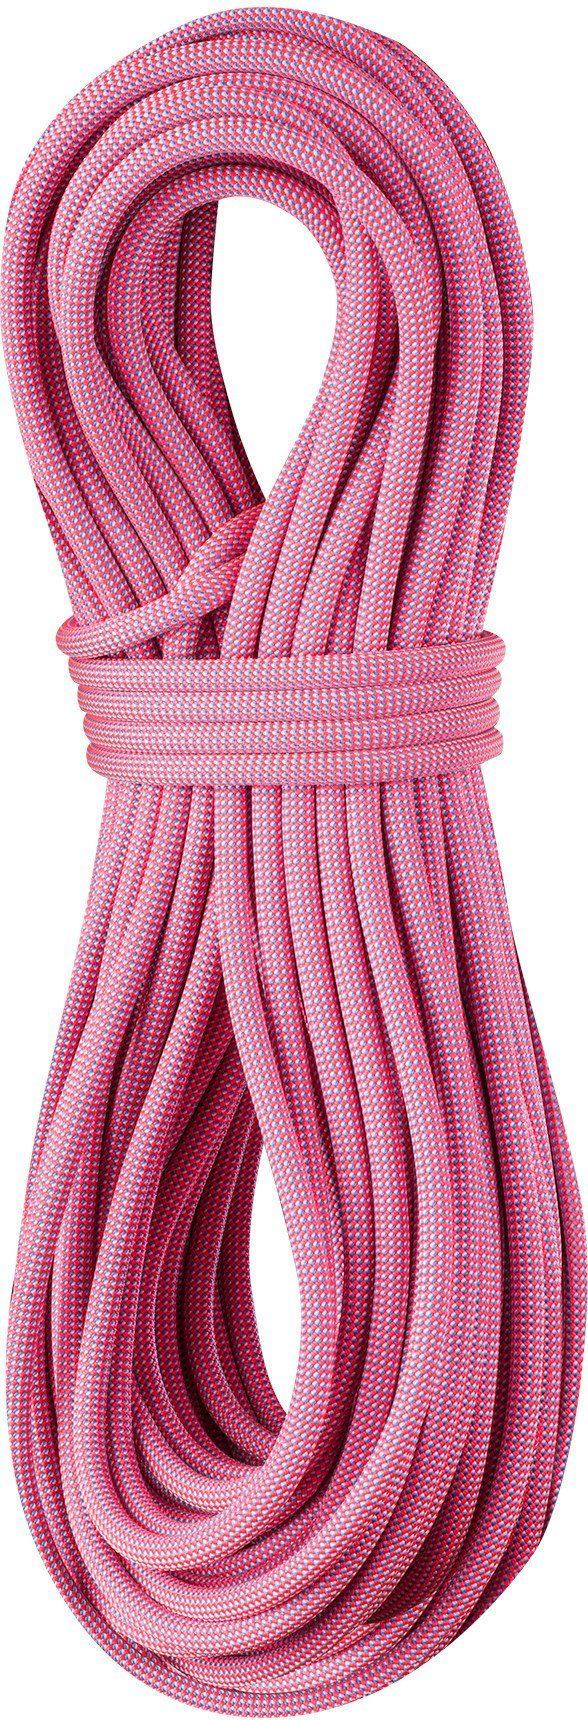 Edelrid Kletterseil »Topaz Pro Dry Rope 9,2mm 60m«